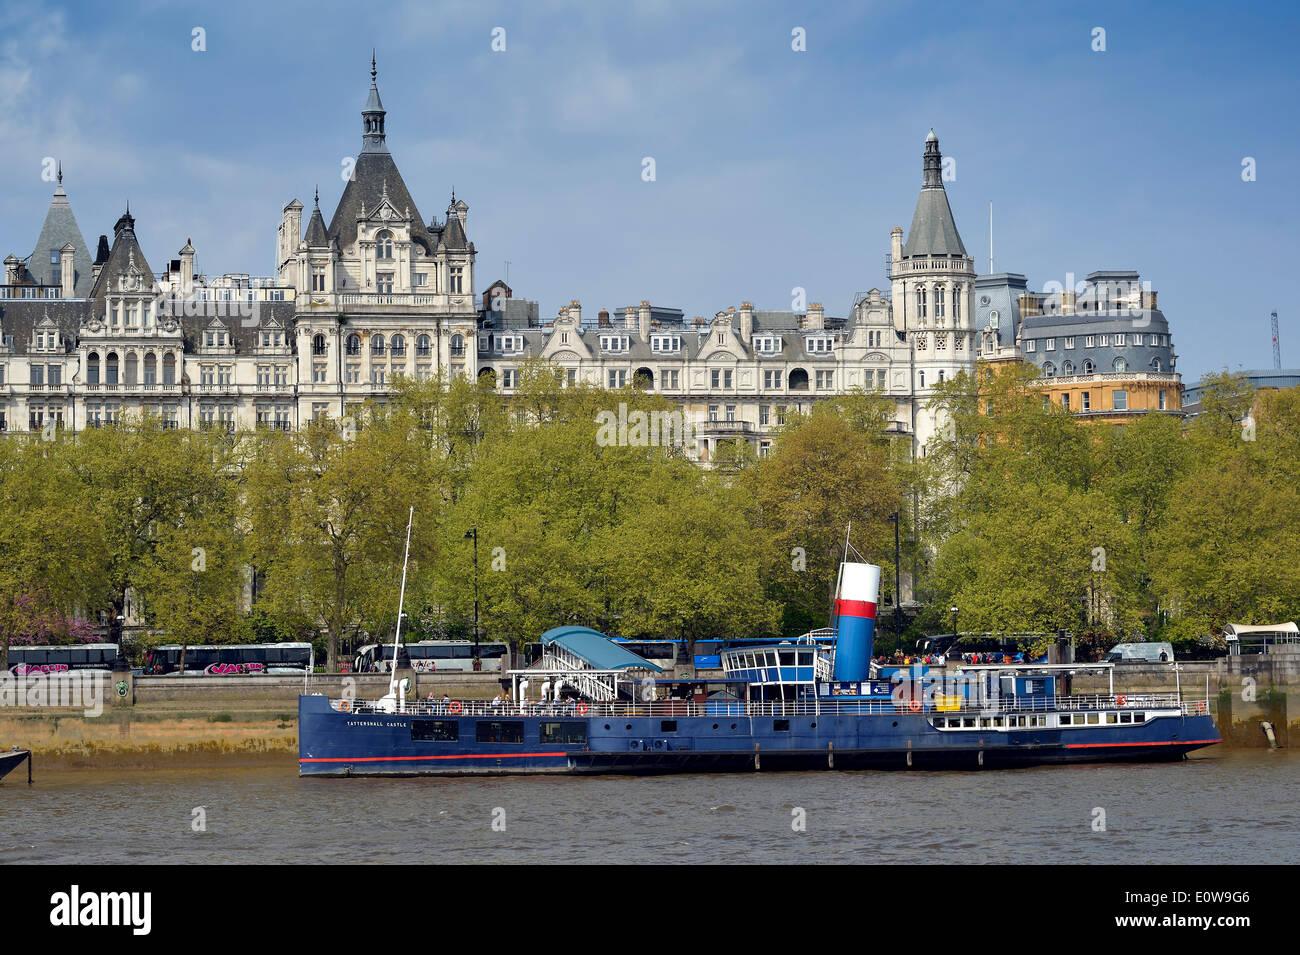 HMS President on the River Thames at Victoria Embankment, London, England, Greeting Kingdom - Stock Image